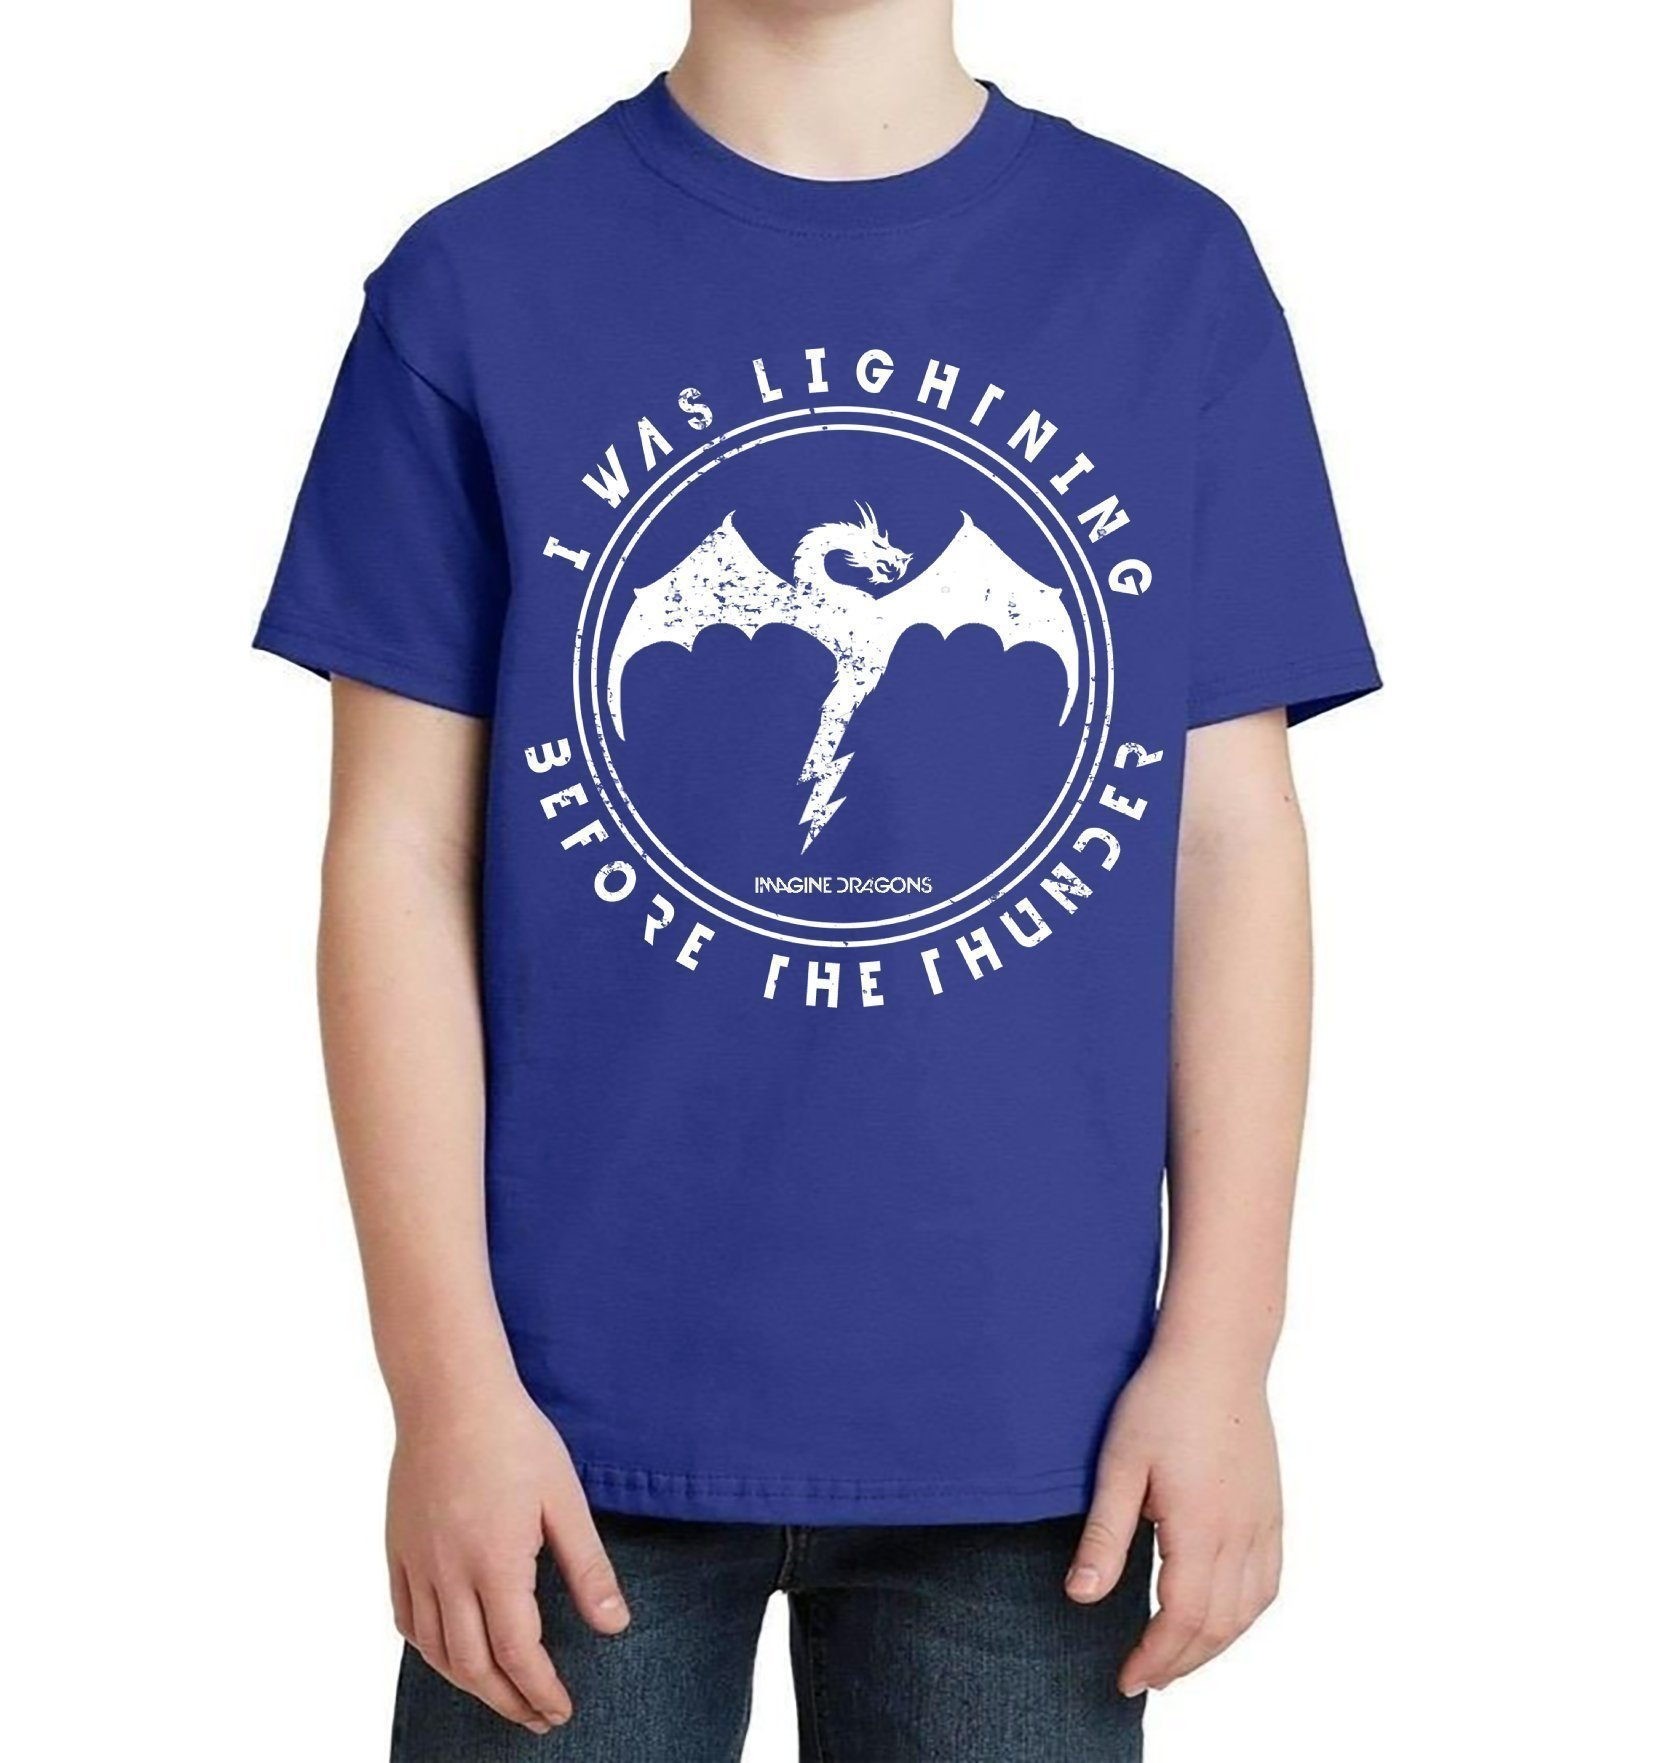 Imagine Dragons Kids T-Shirt - Imagine Dragons TShirt - Imagine Dragons Kids Tee Shirt - Thunder Lyrics - Imagine Dragons Youth Shirt - Childrens Tee Shirt